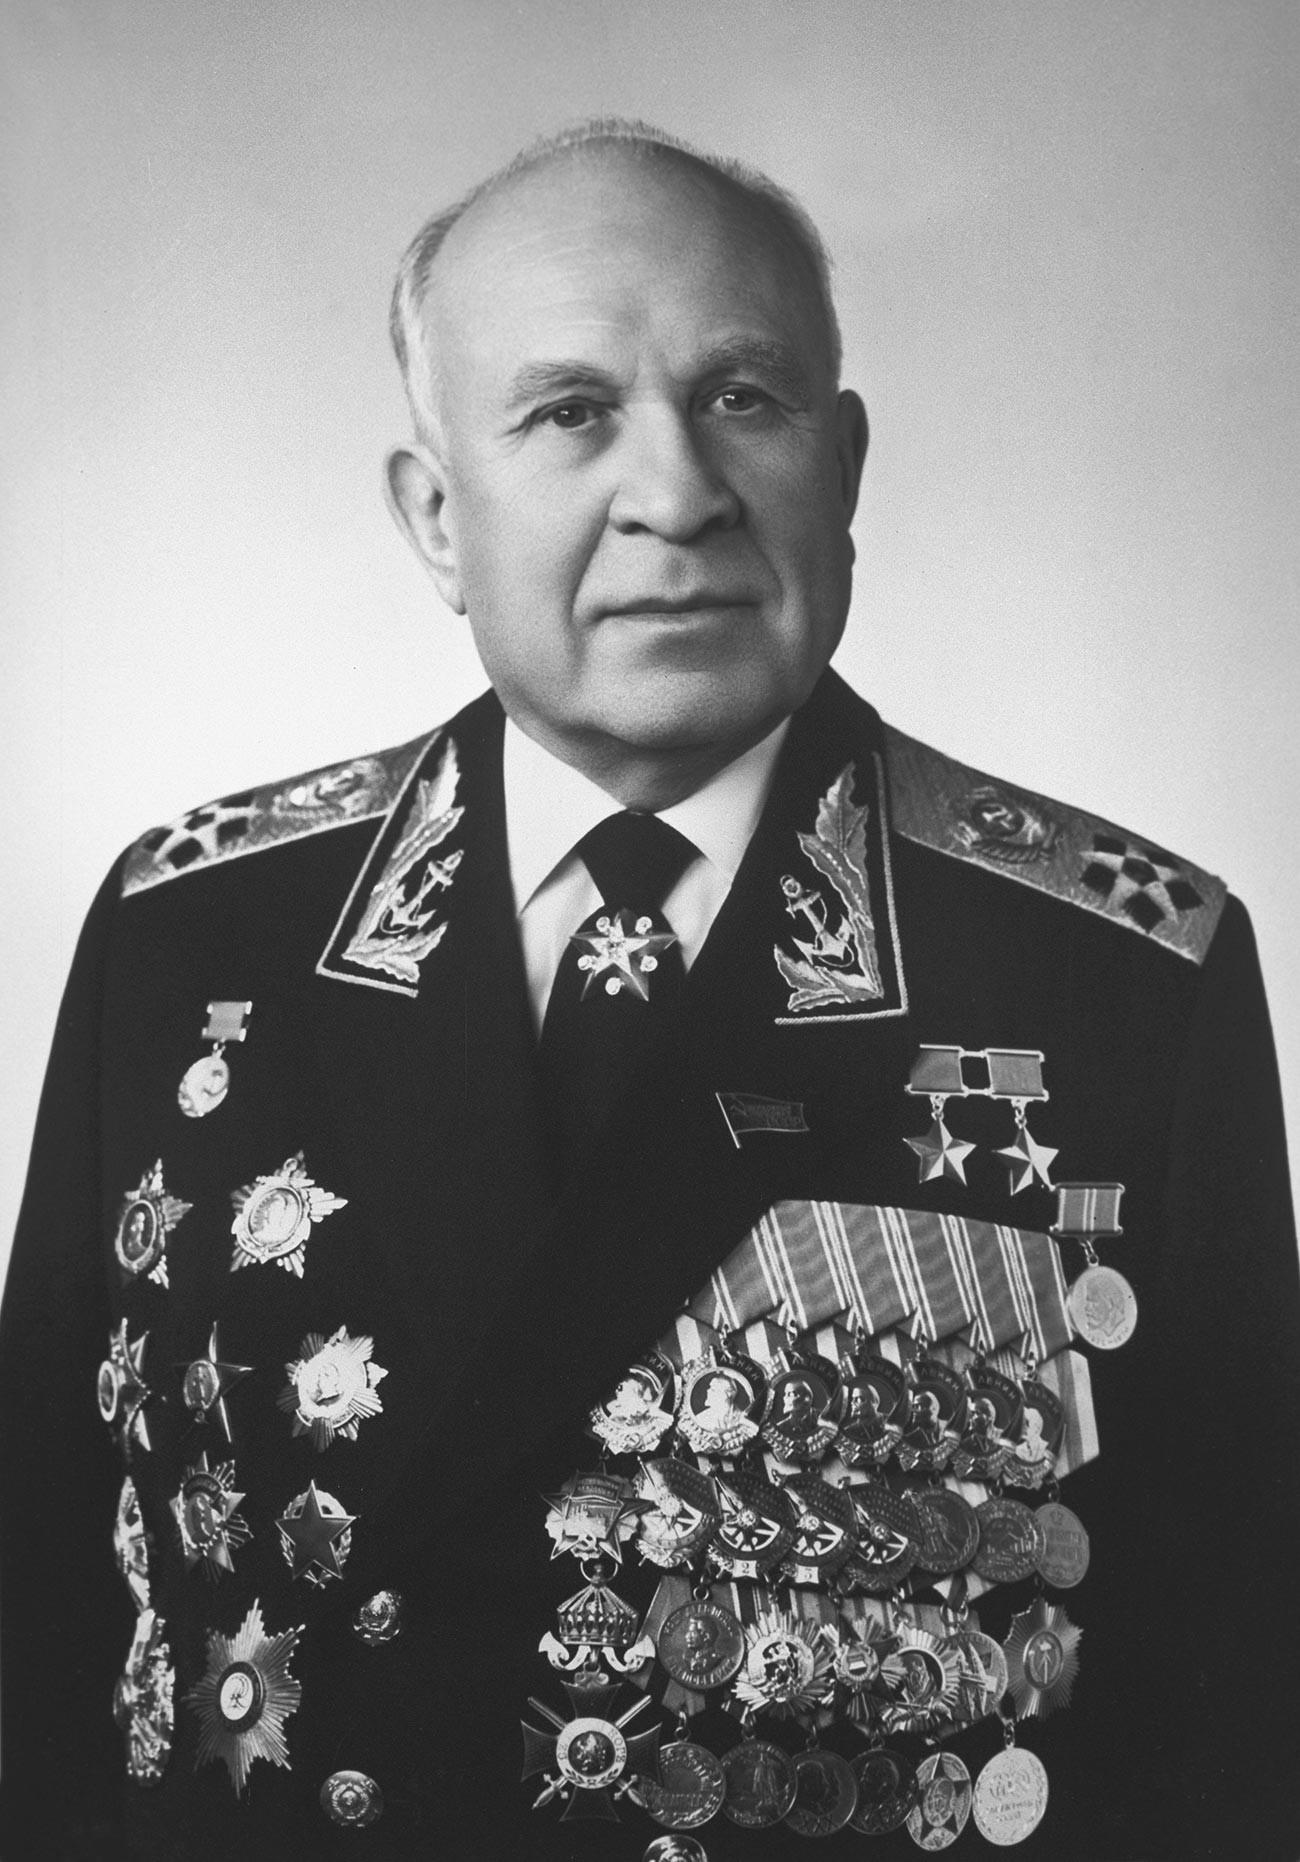 Almirante de la Flota, Héroe de la Unión Soviética Serguéi Gorshkov.